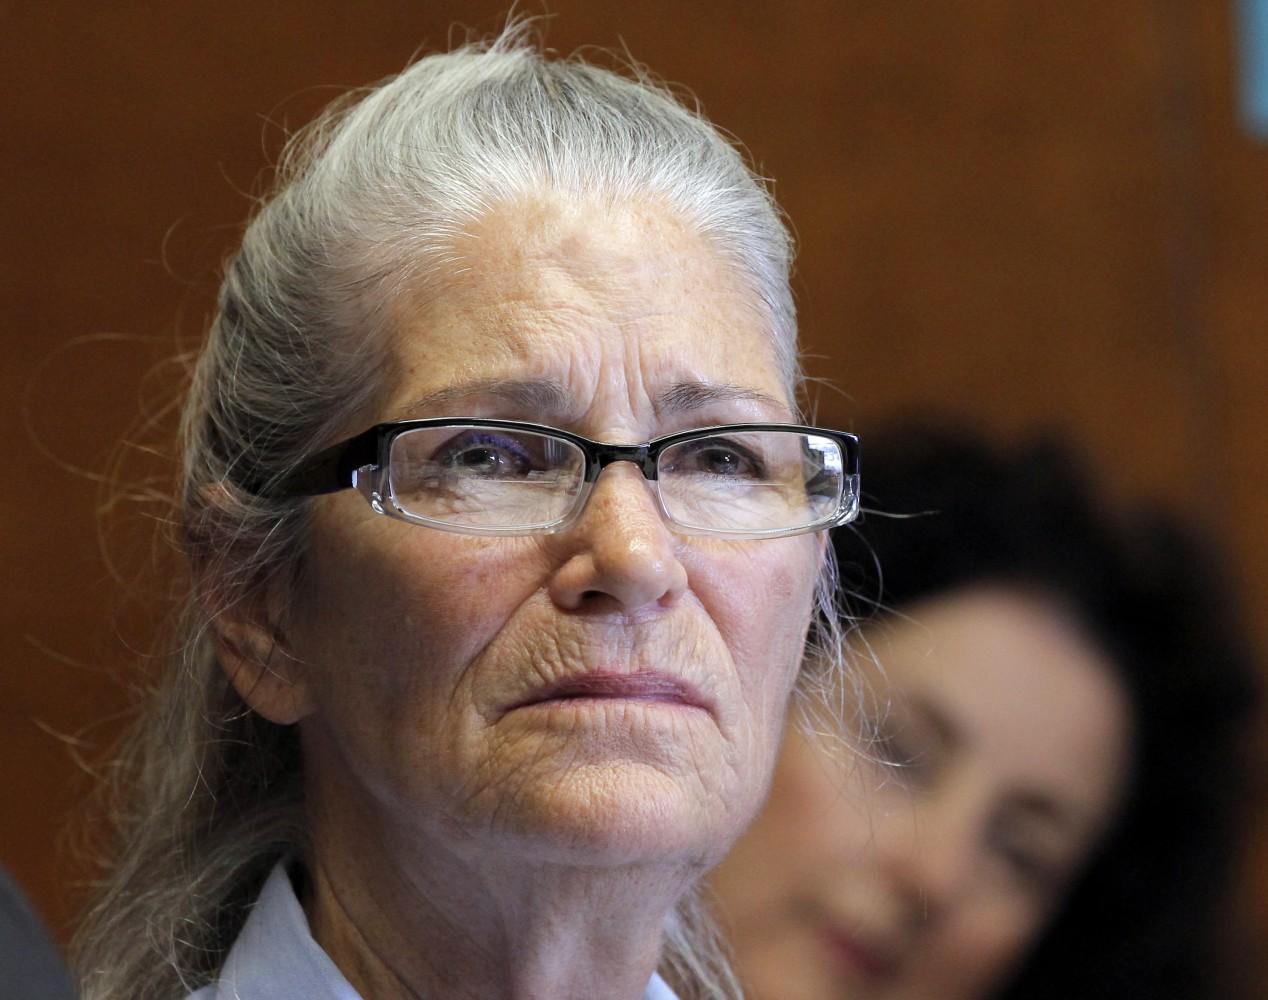 Leslie Van Houten, Manson Family Cult Member, Seeks Parole ...